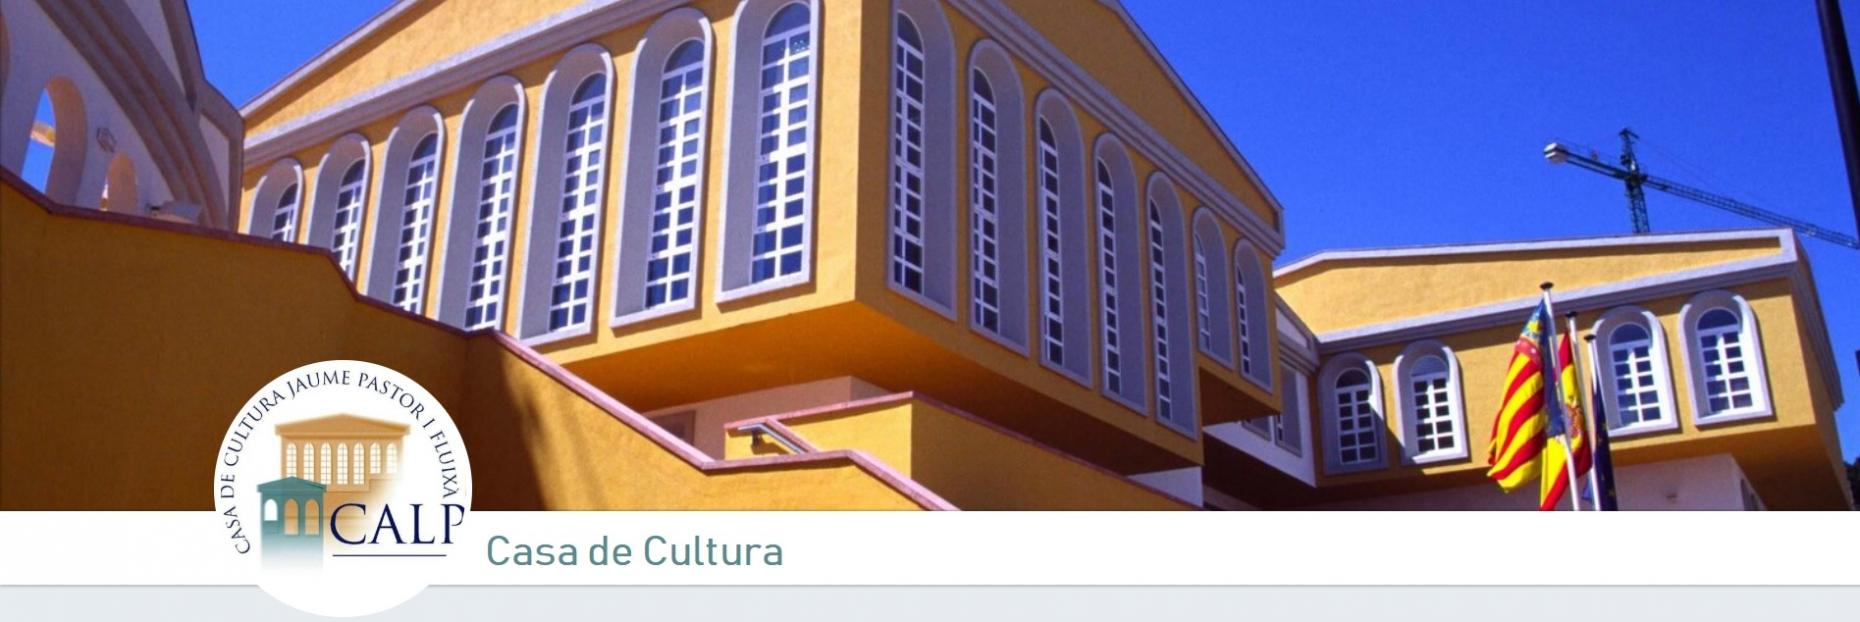 Cinema Listings: Cine Calp at the Casa de Cultura Calpe